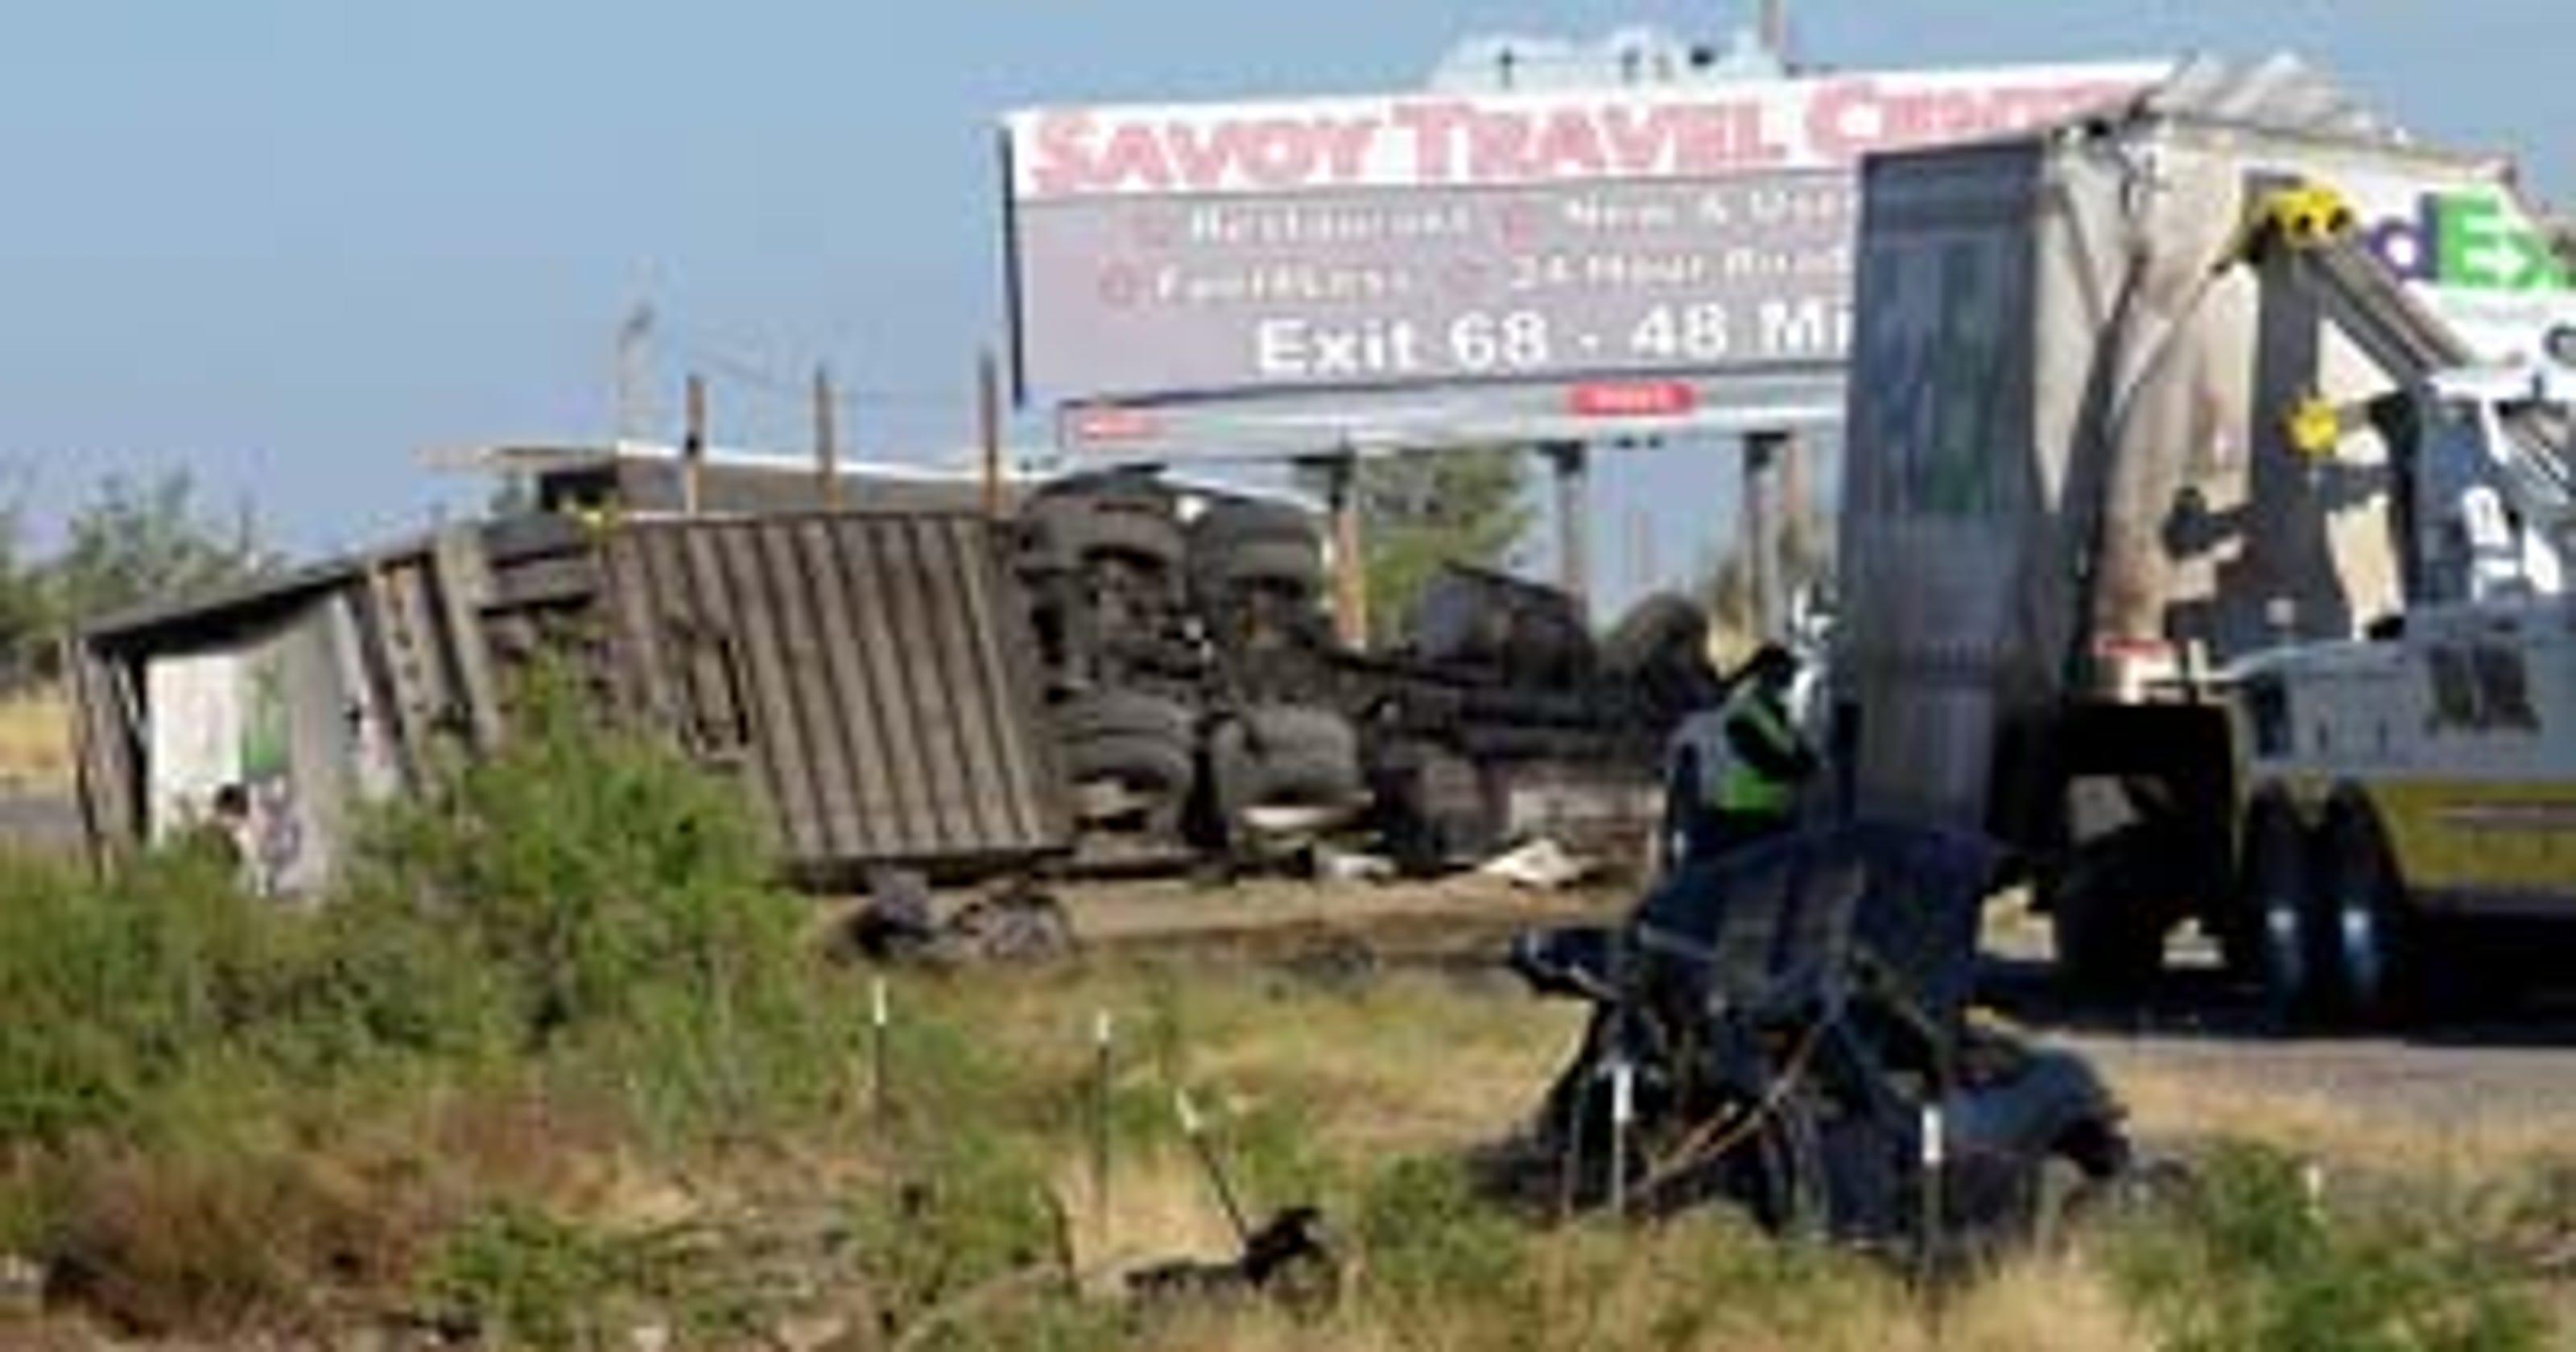 Appeals court upholds $165M-plus judgment in I-10 crash